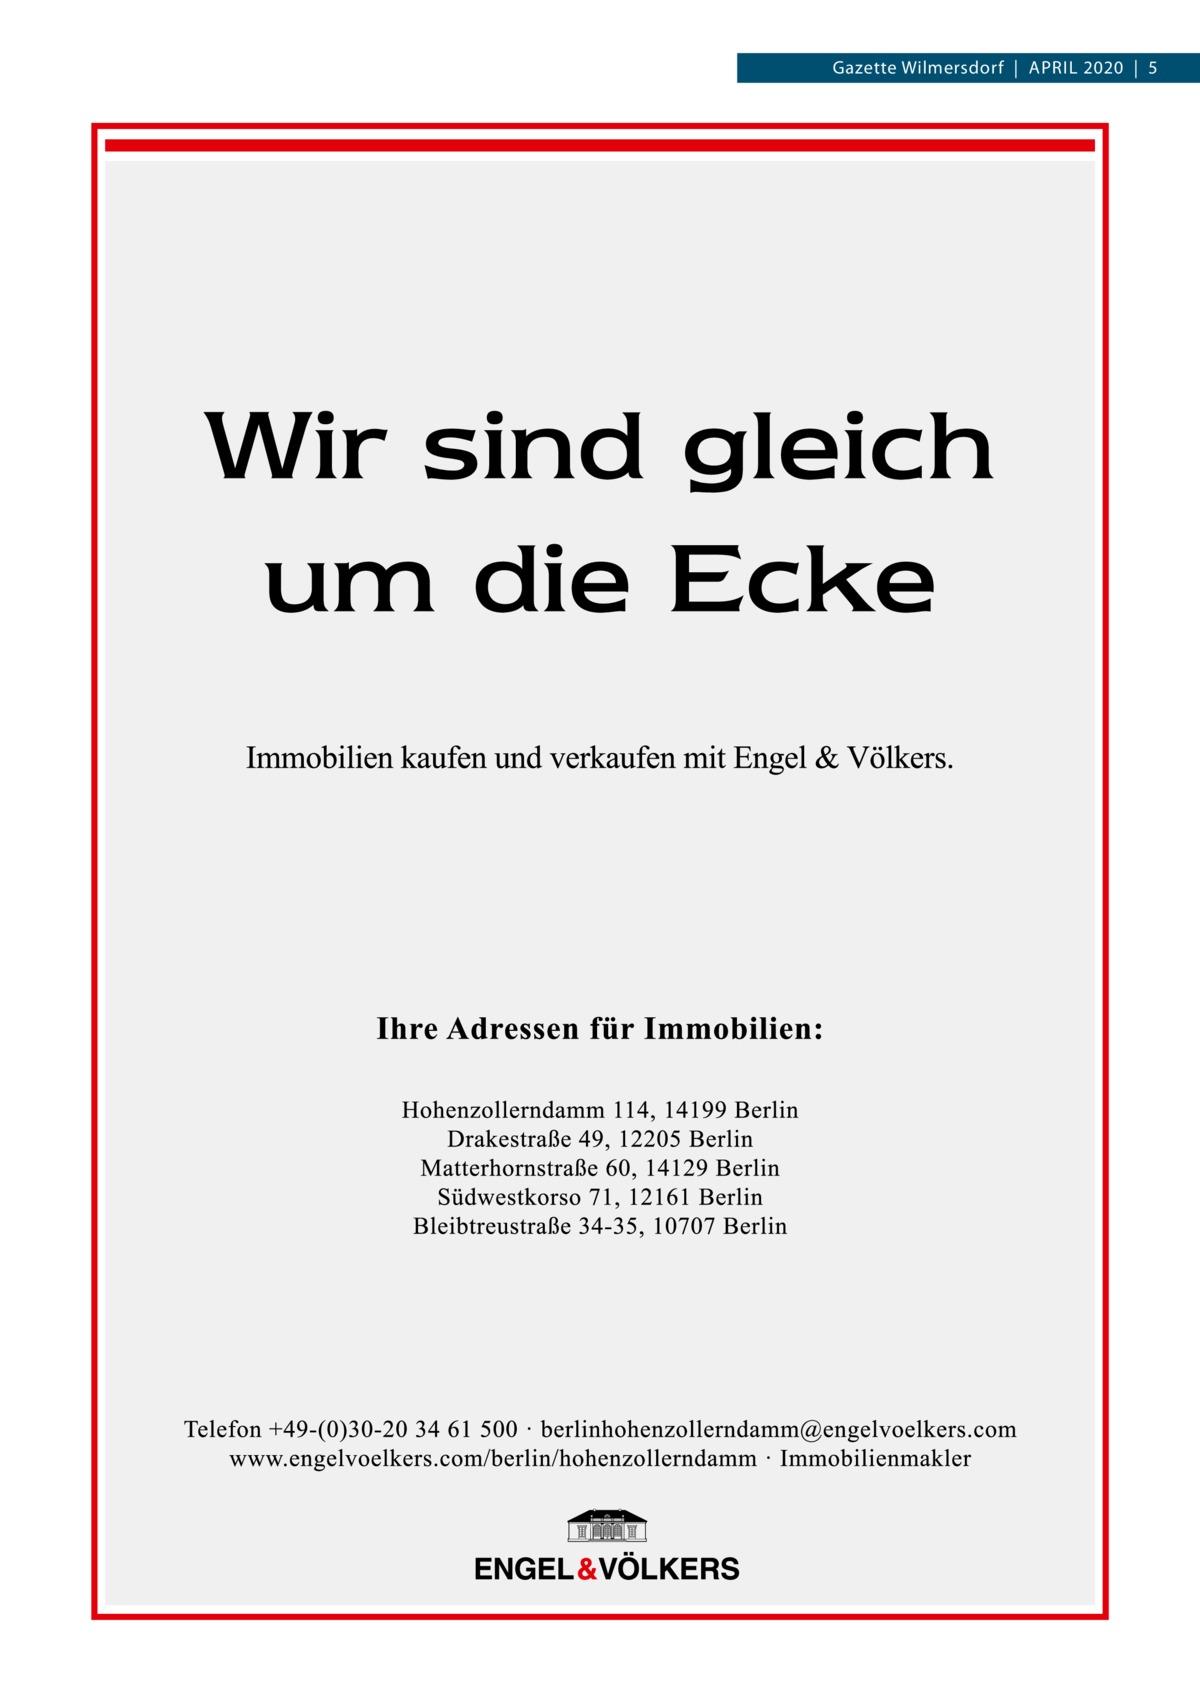 Gazette Wilmersdorf April 2020 5